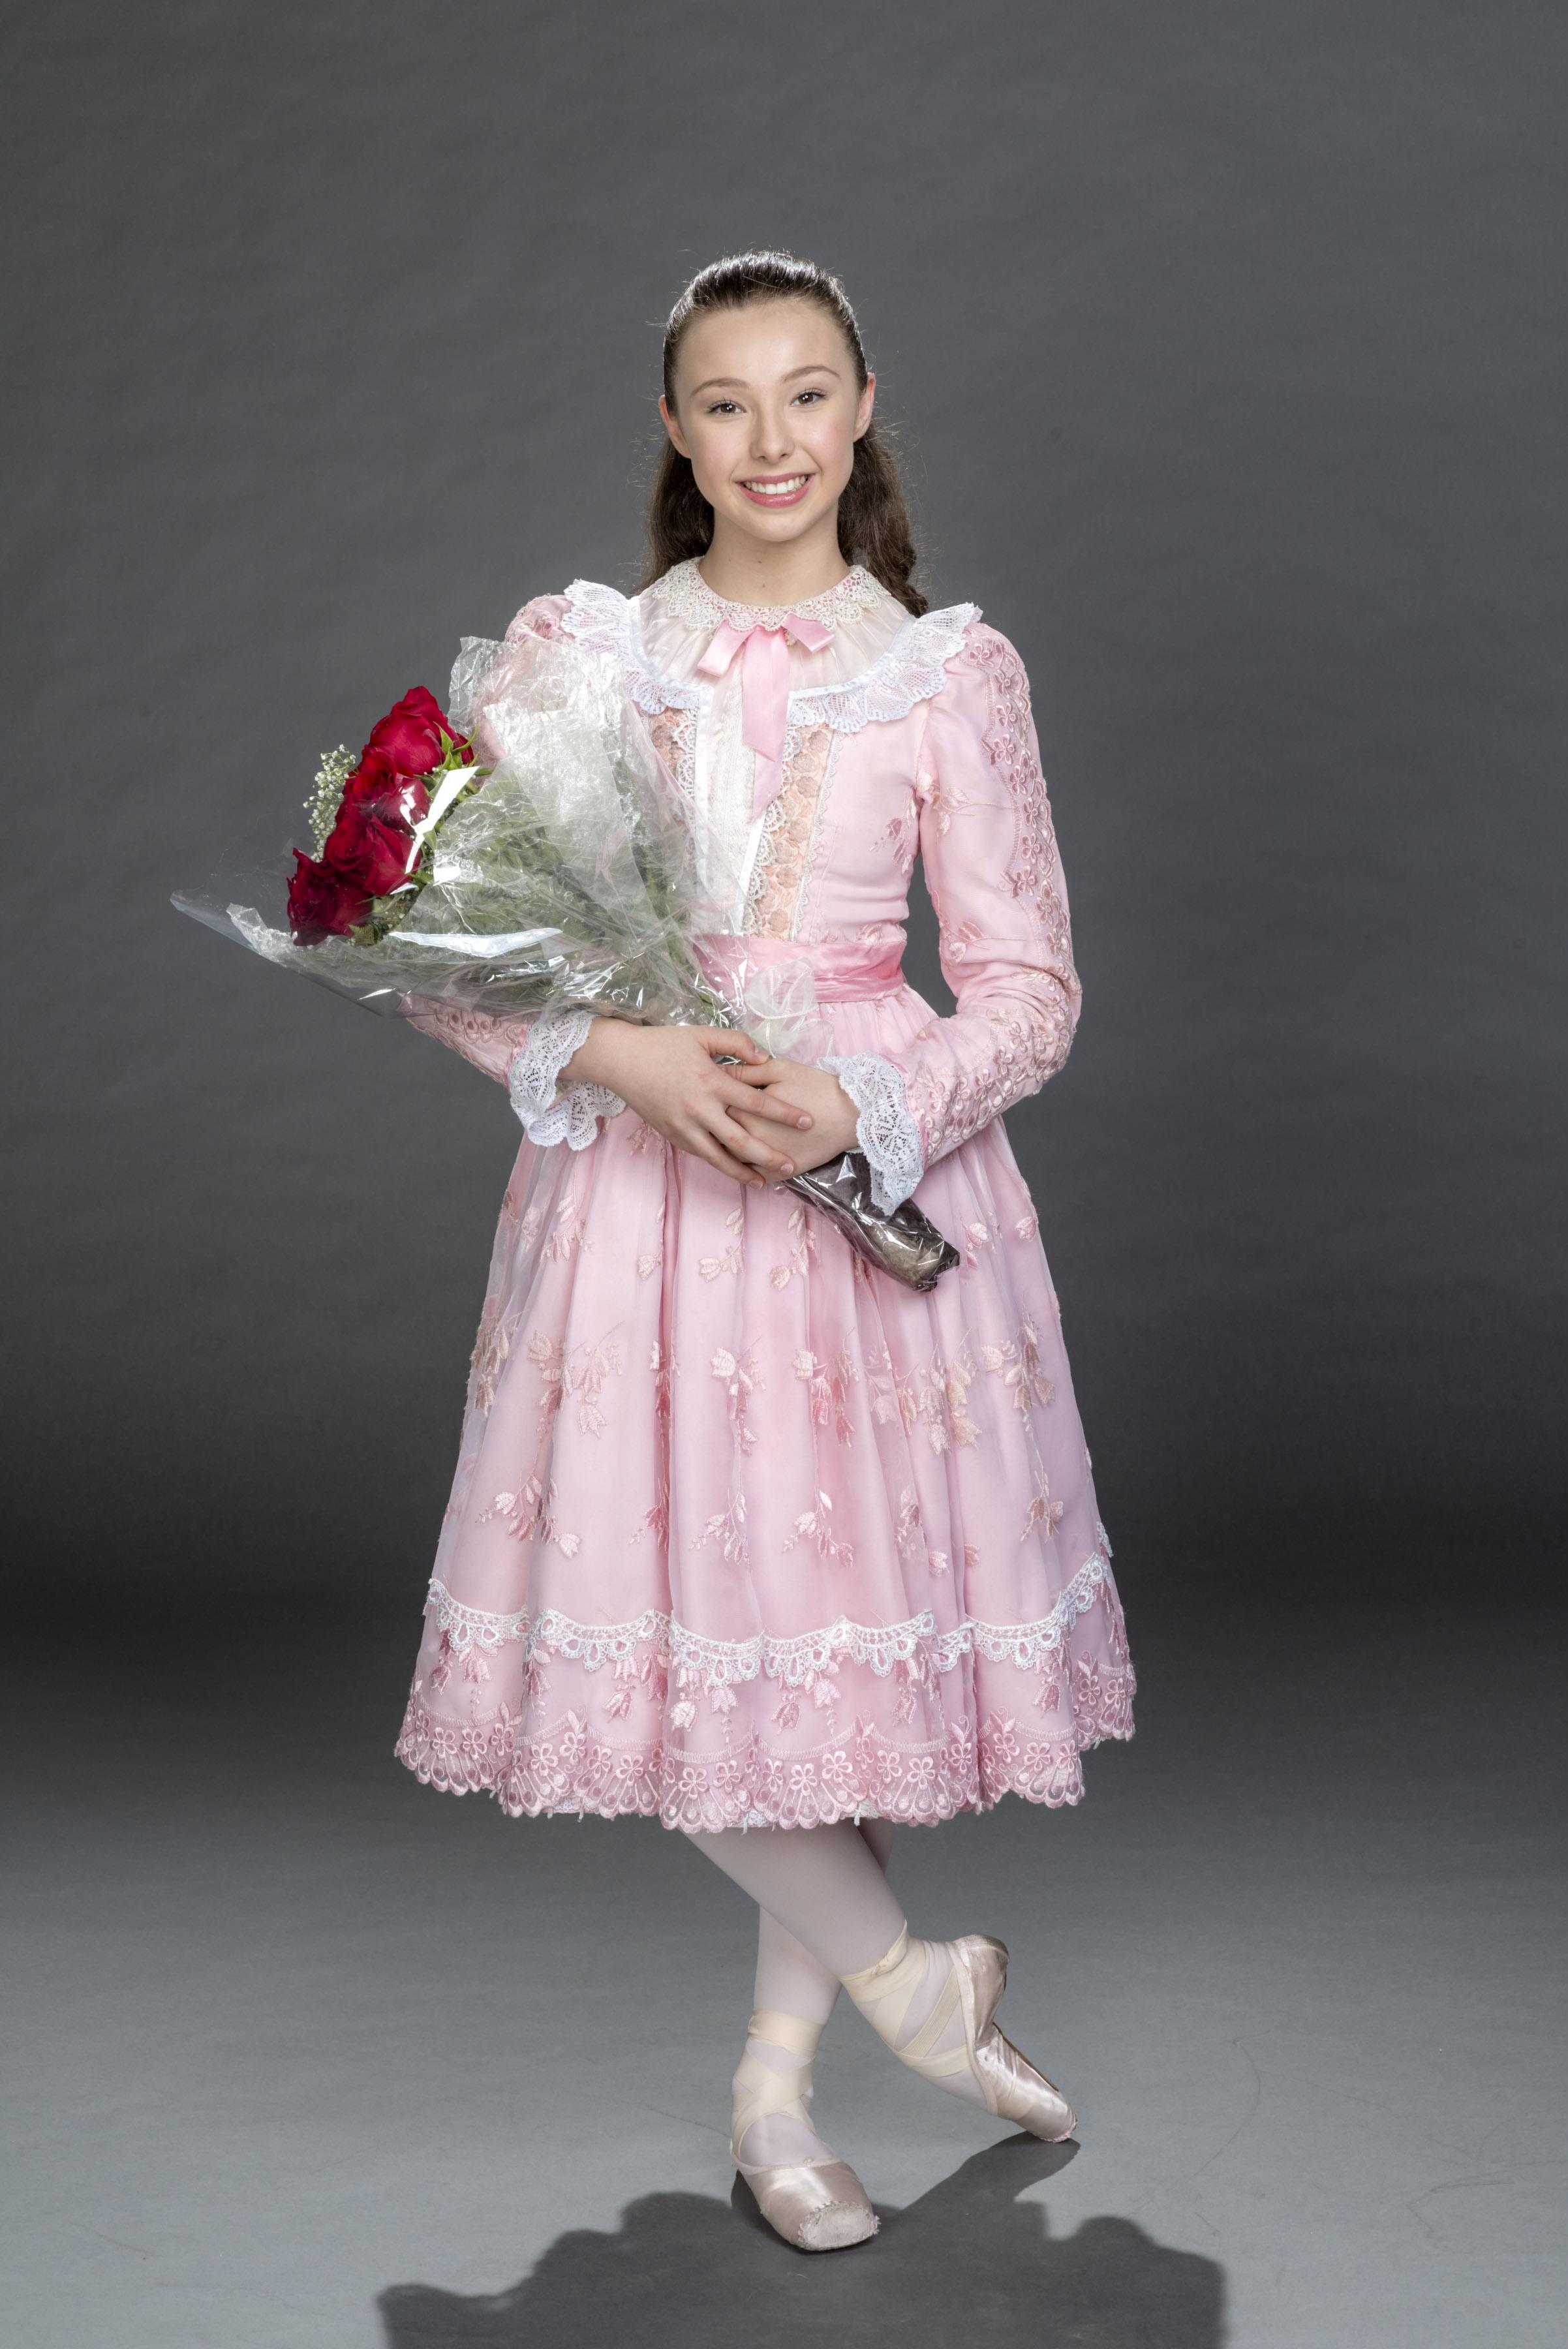 sascha radetsky wife